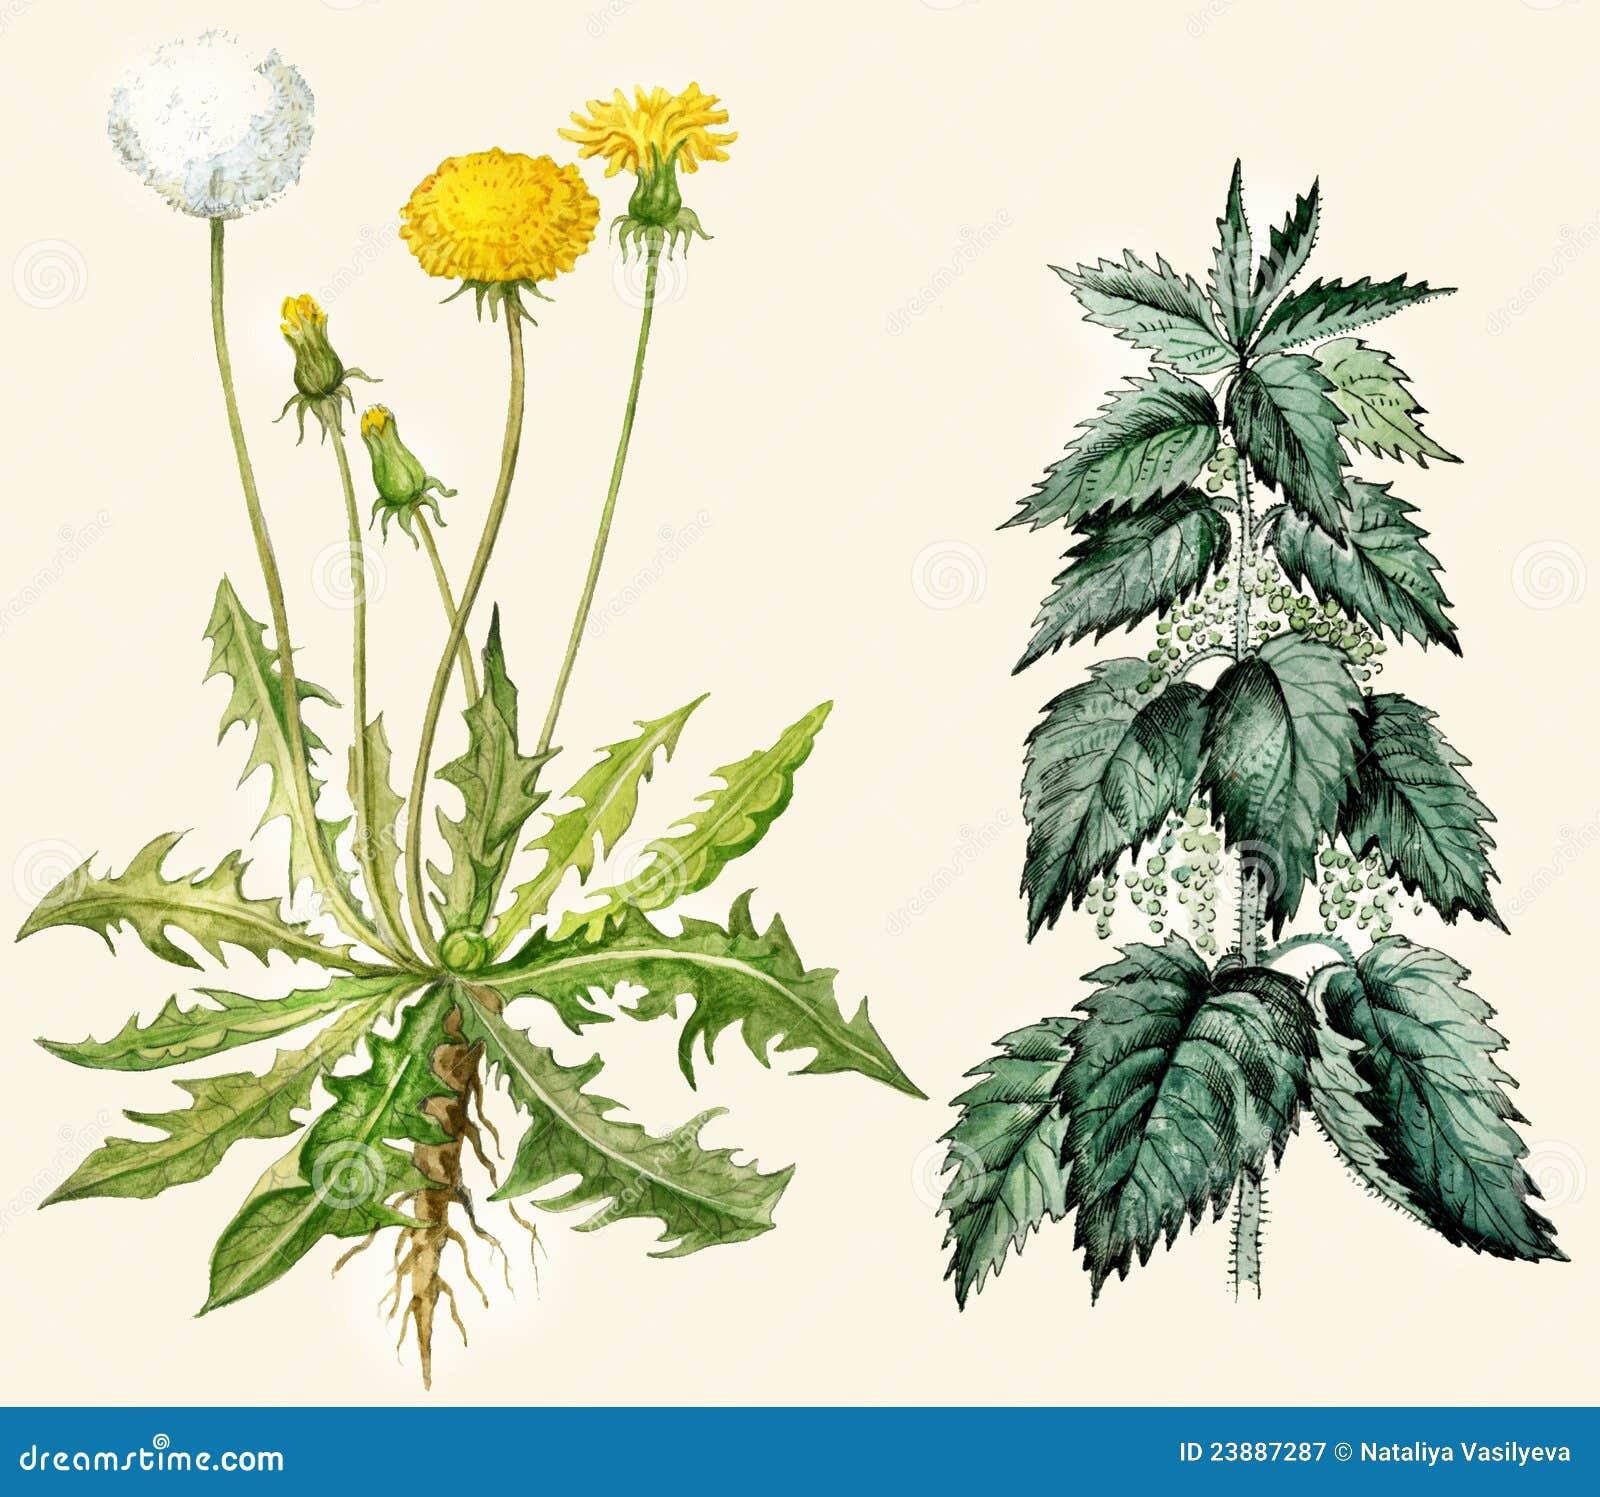 Dandelion and nettle